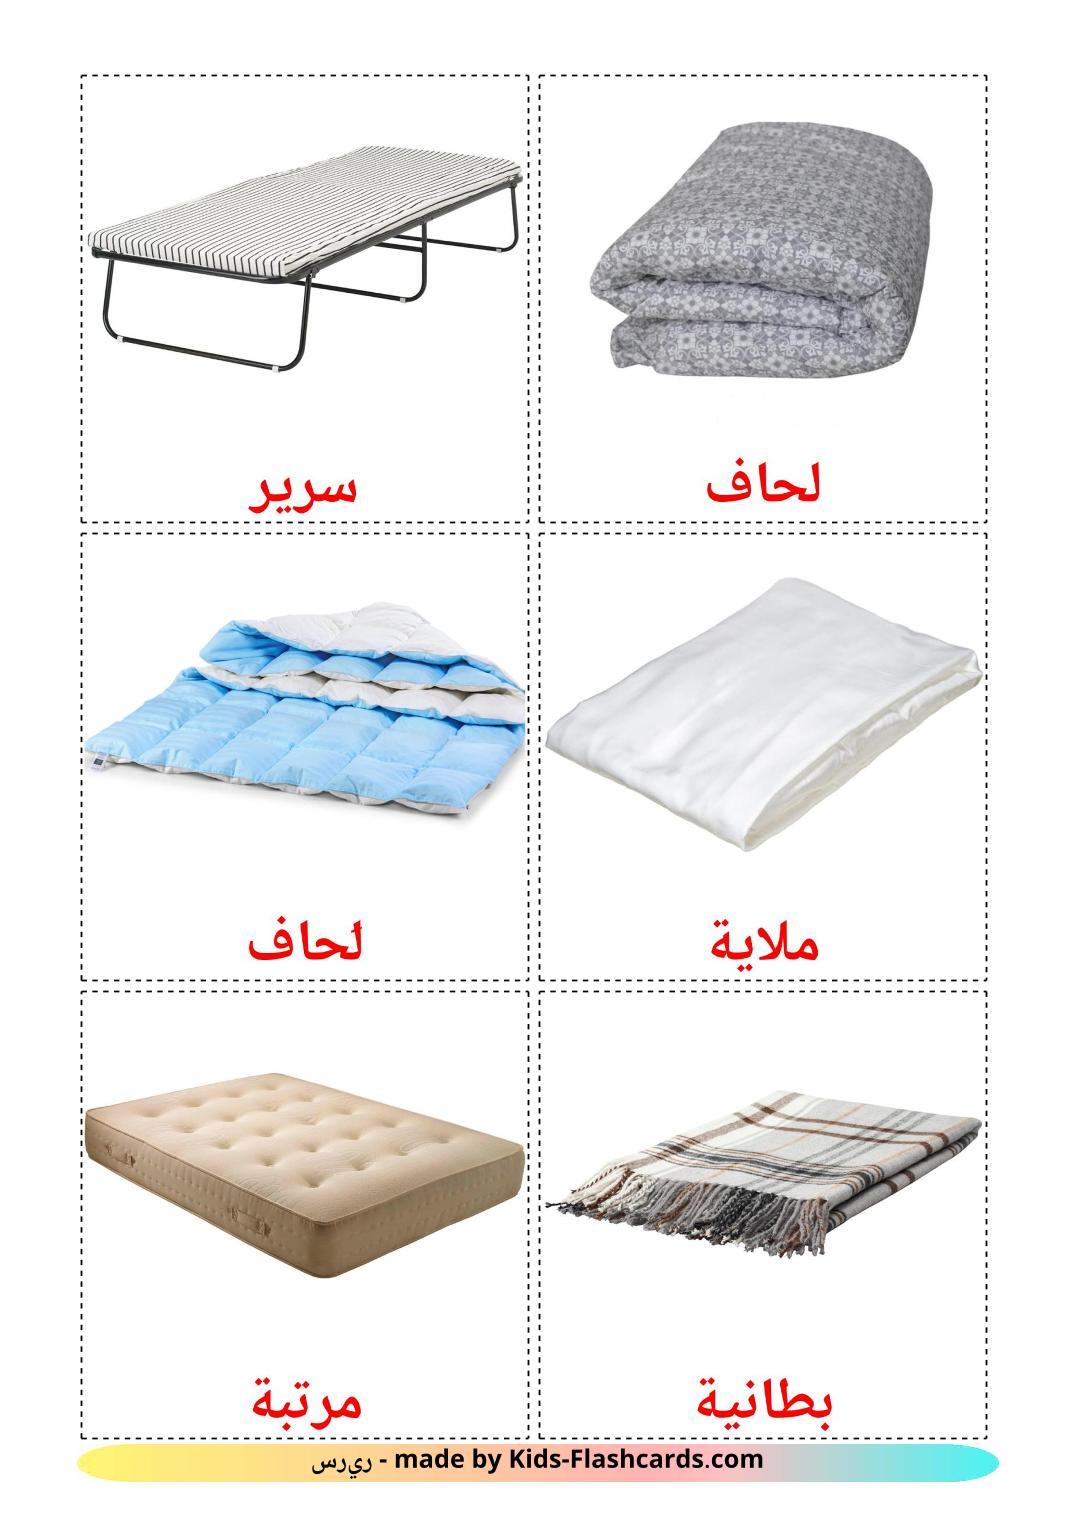 Bed - 15 Free Printable arabic Flashcards